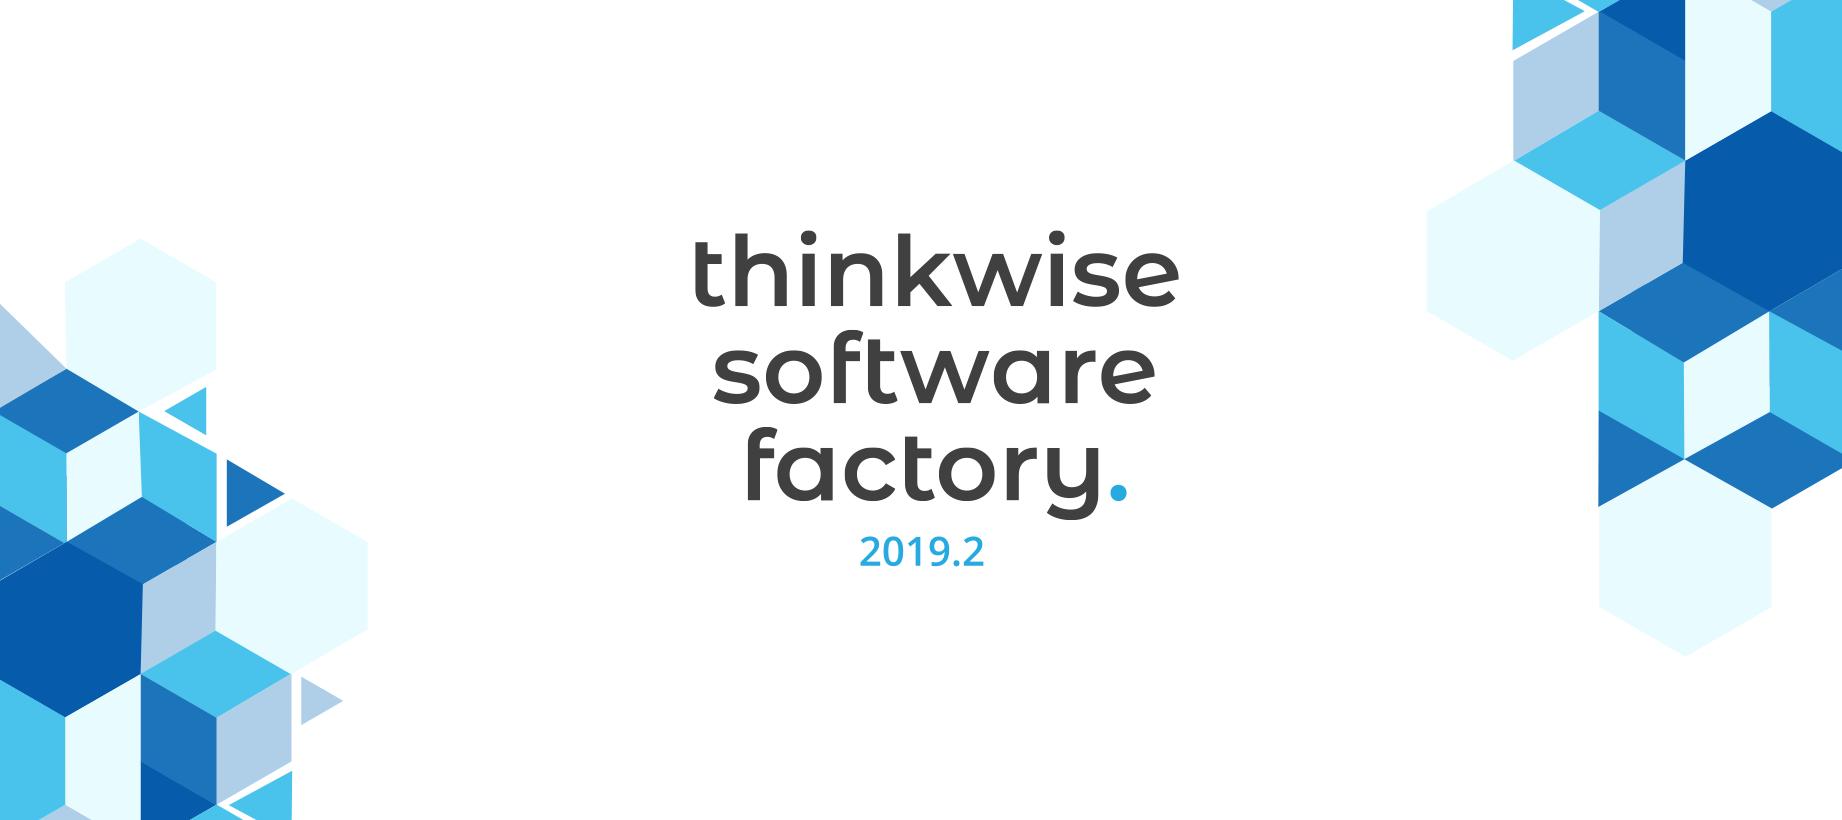 Thinkwise Platform release 2019.2